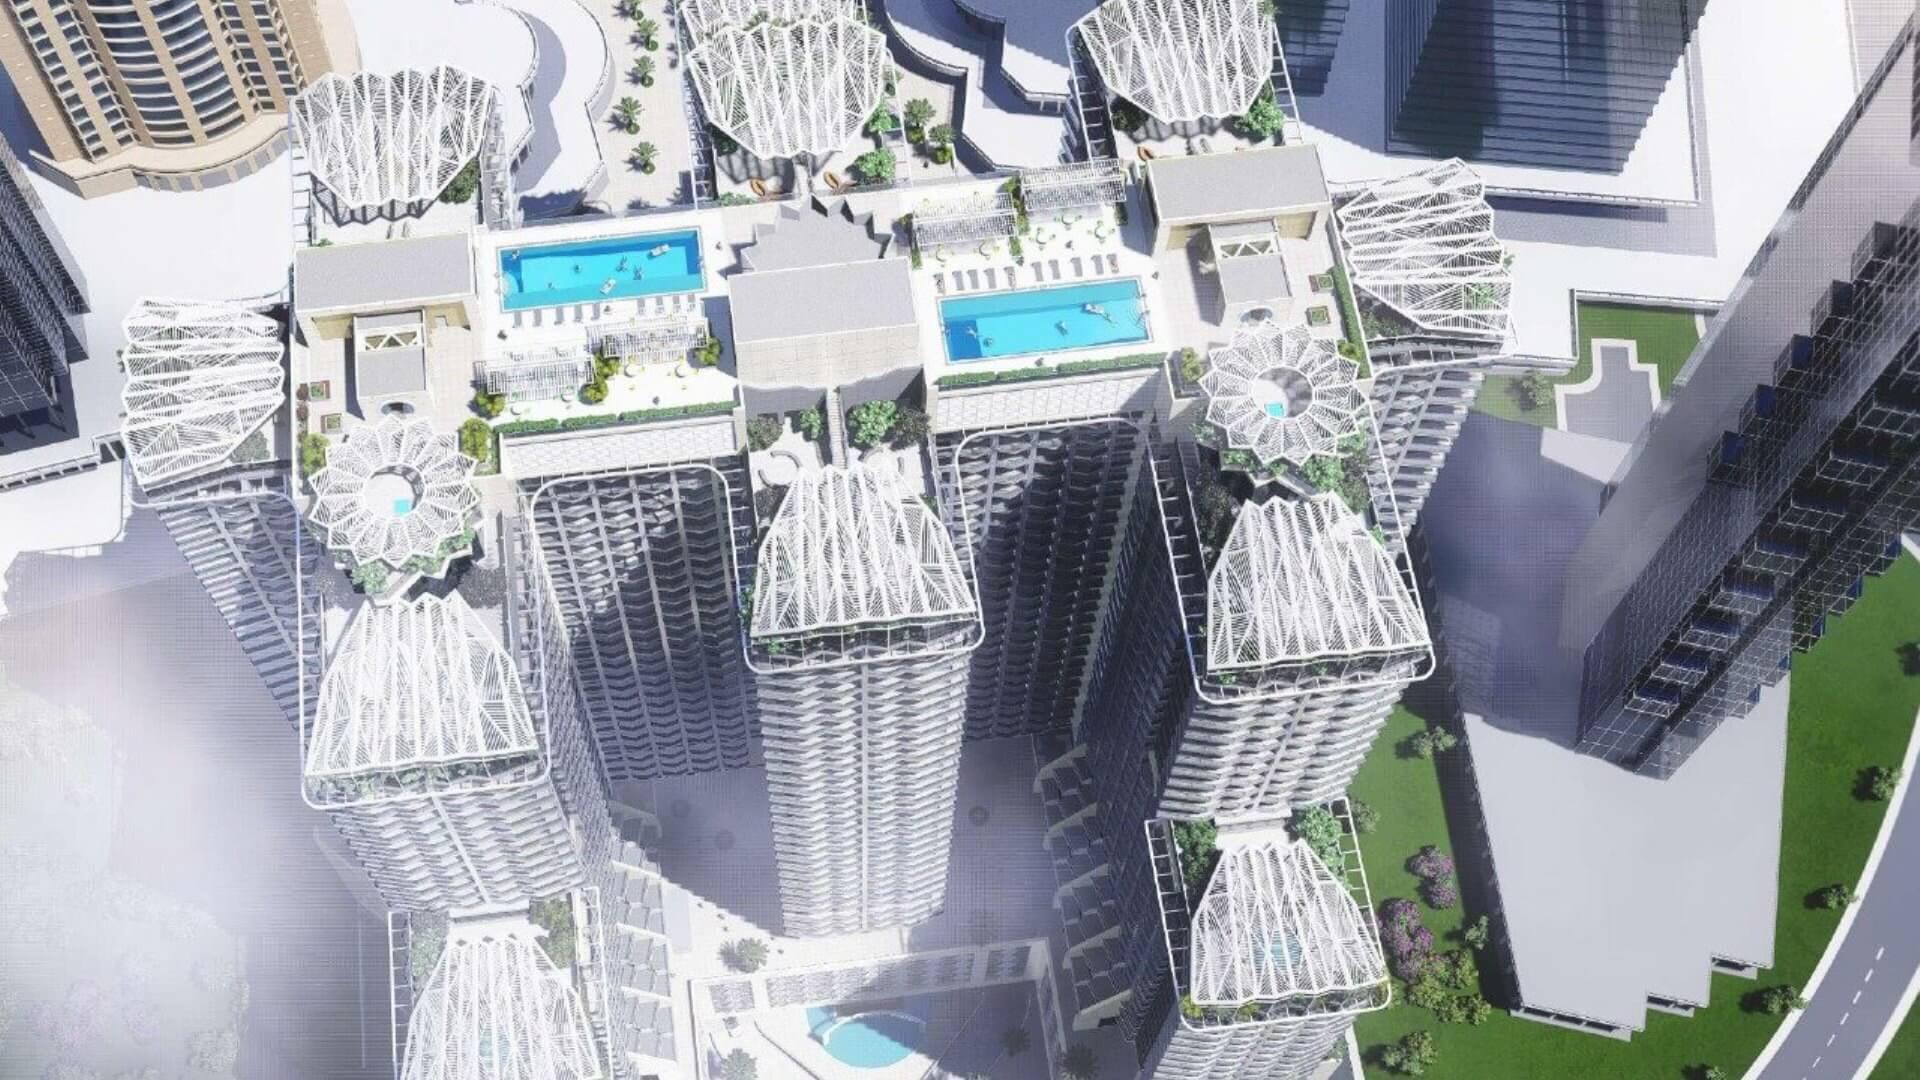 GOLF VIEWS SEVEN CITY, Jumeirah Lake Towers, Dubai, UAE – photo 6